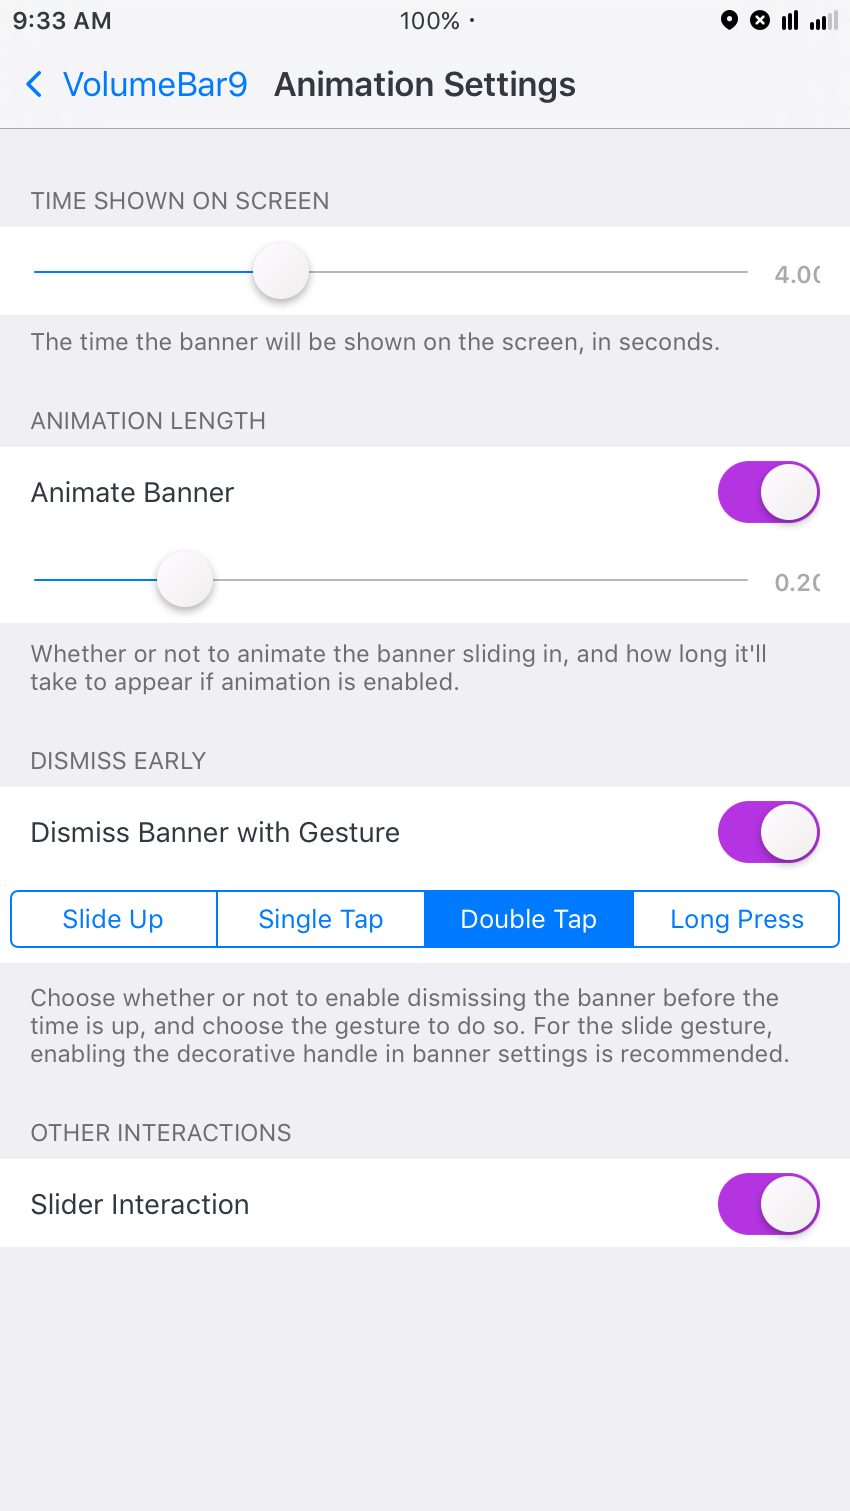 animation_settings